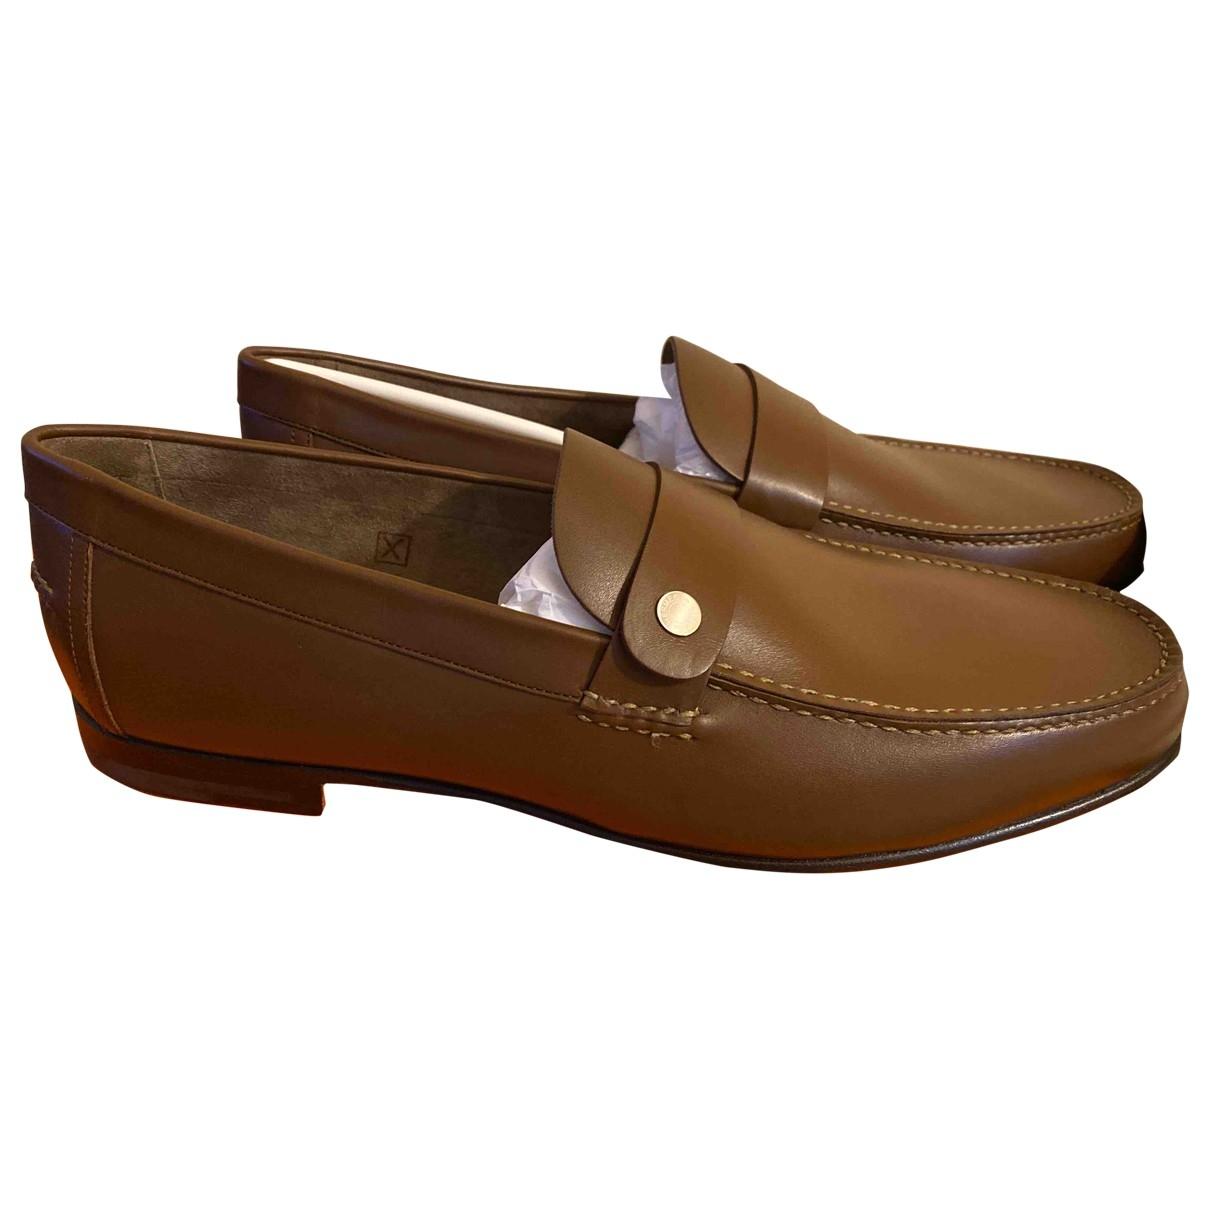 Hermès Odéon Camel Leather Flats for Men 44 EU